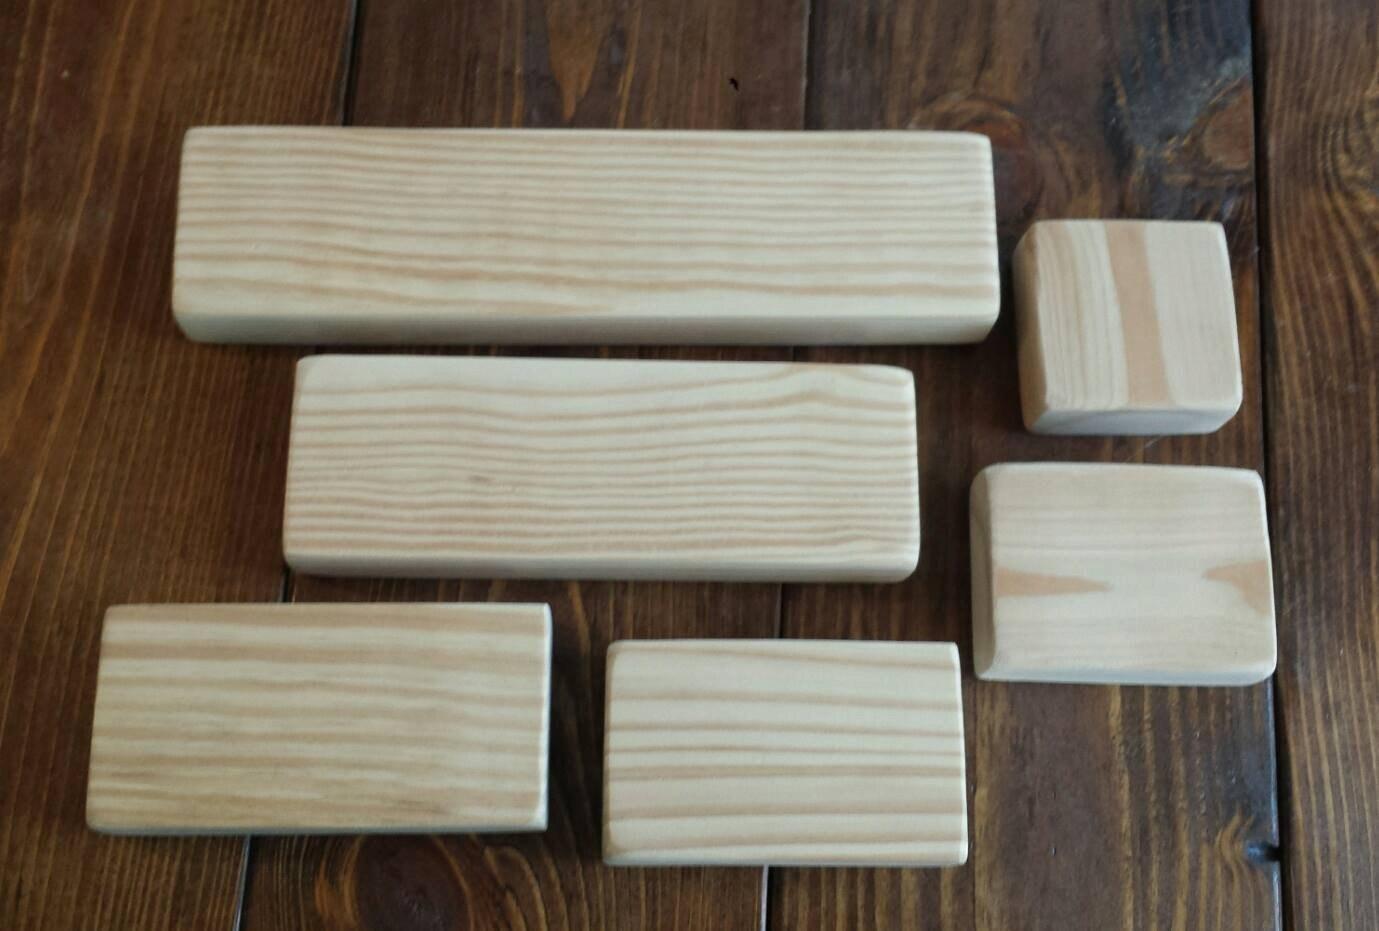 Custom wood shelf board shelving wooden sign block blank for Wooden blocks craft supplies